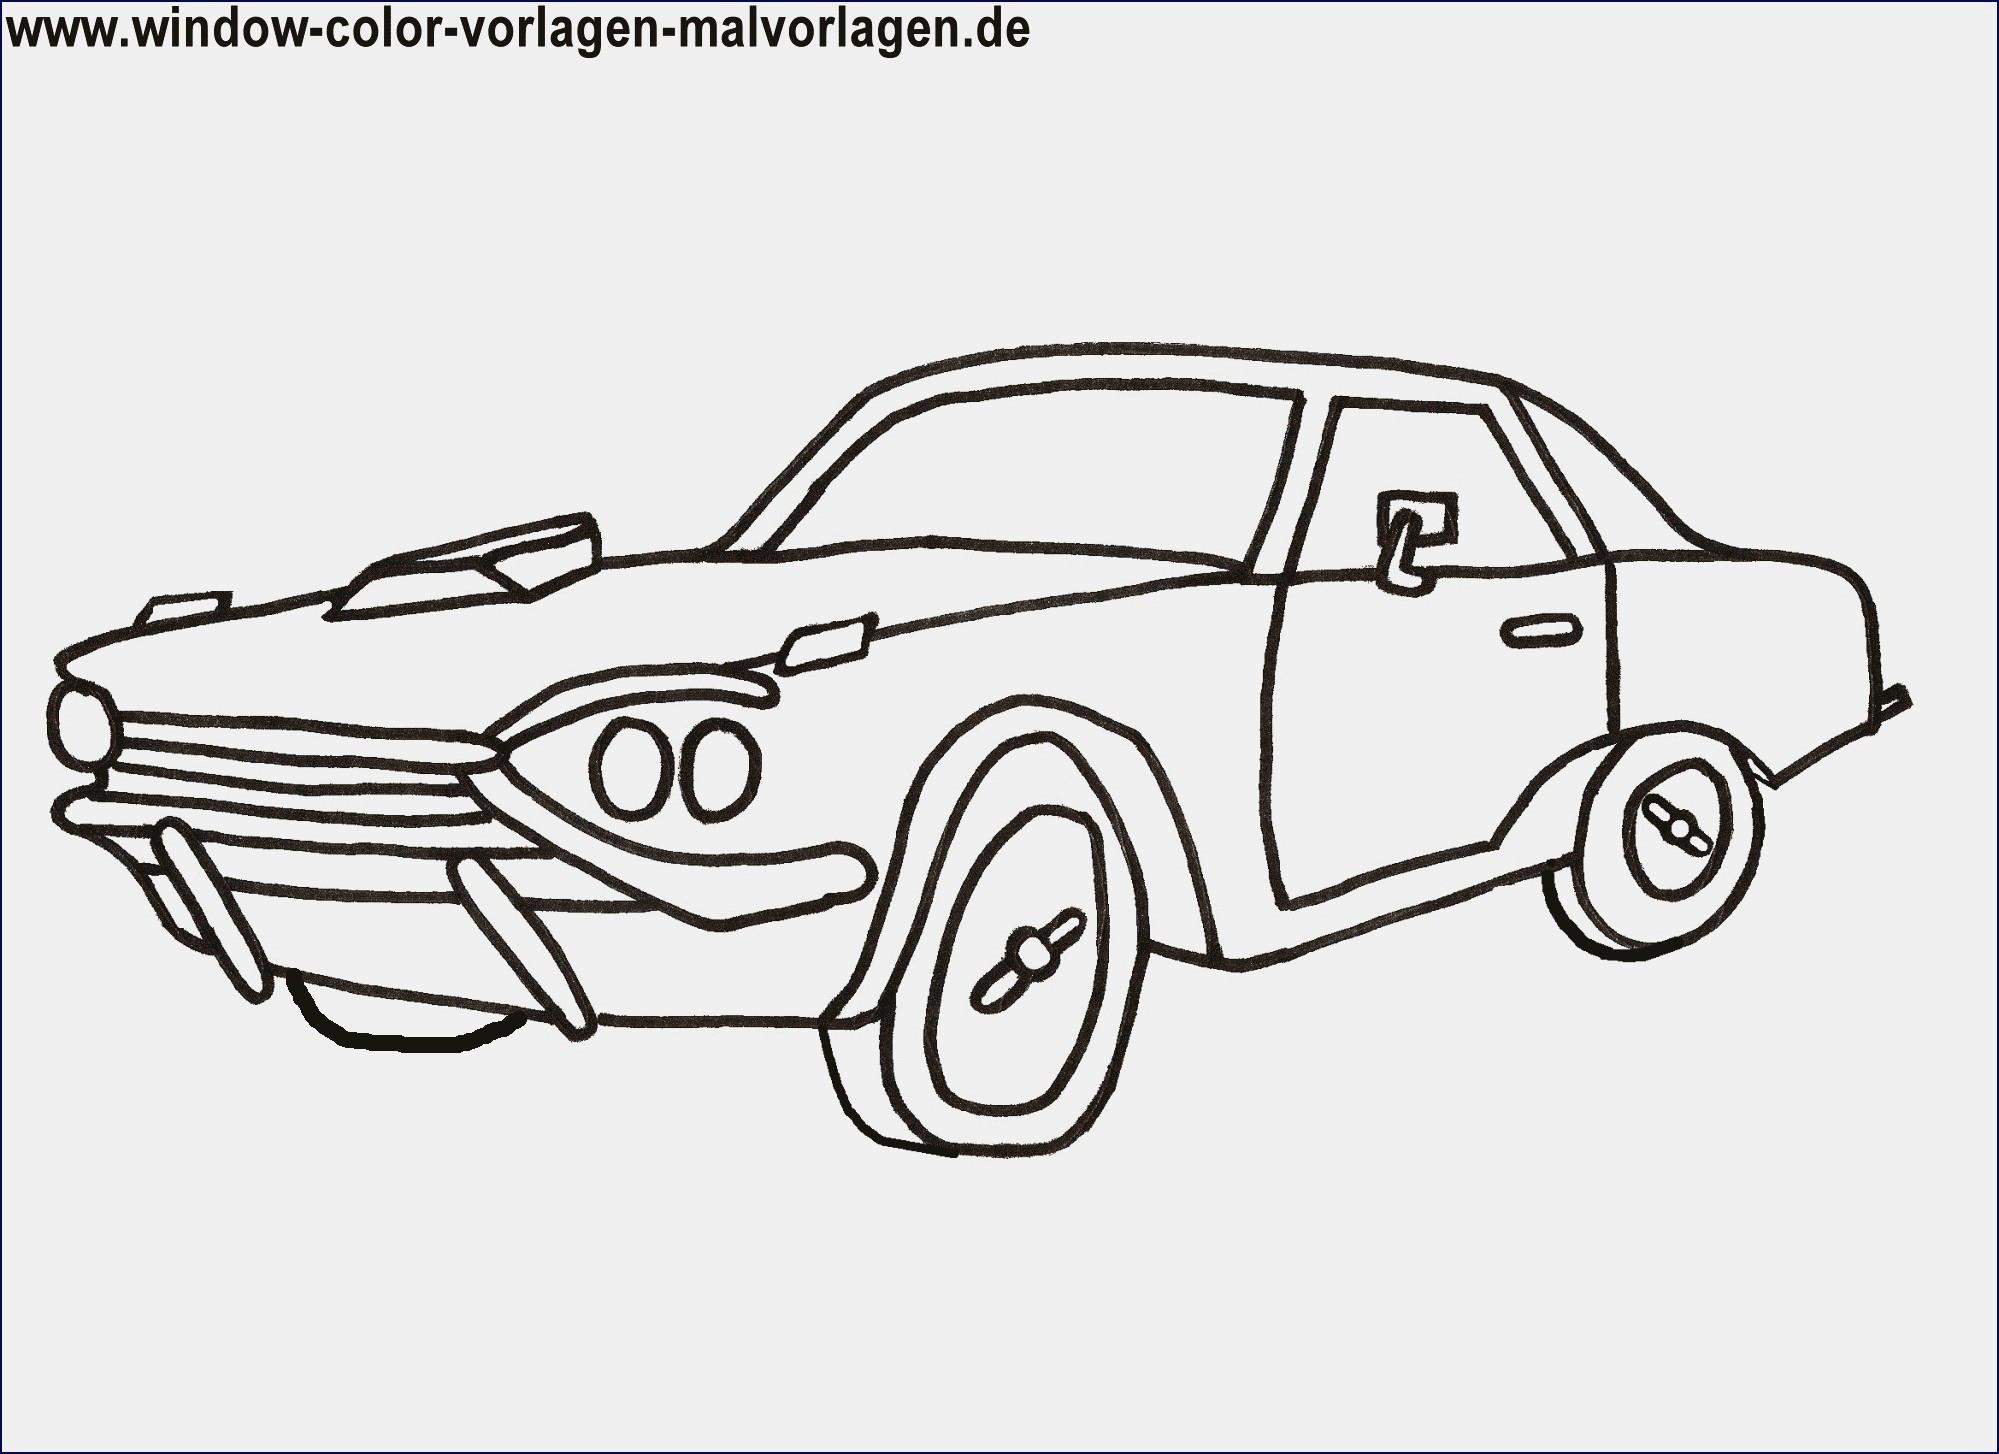 Ausmalbild Lightning Mcqueen Einzigartig Awesome Colouring Disney Cars Genial Cars Ausmalbilder Lightning Das Bild